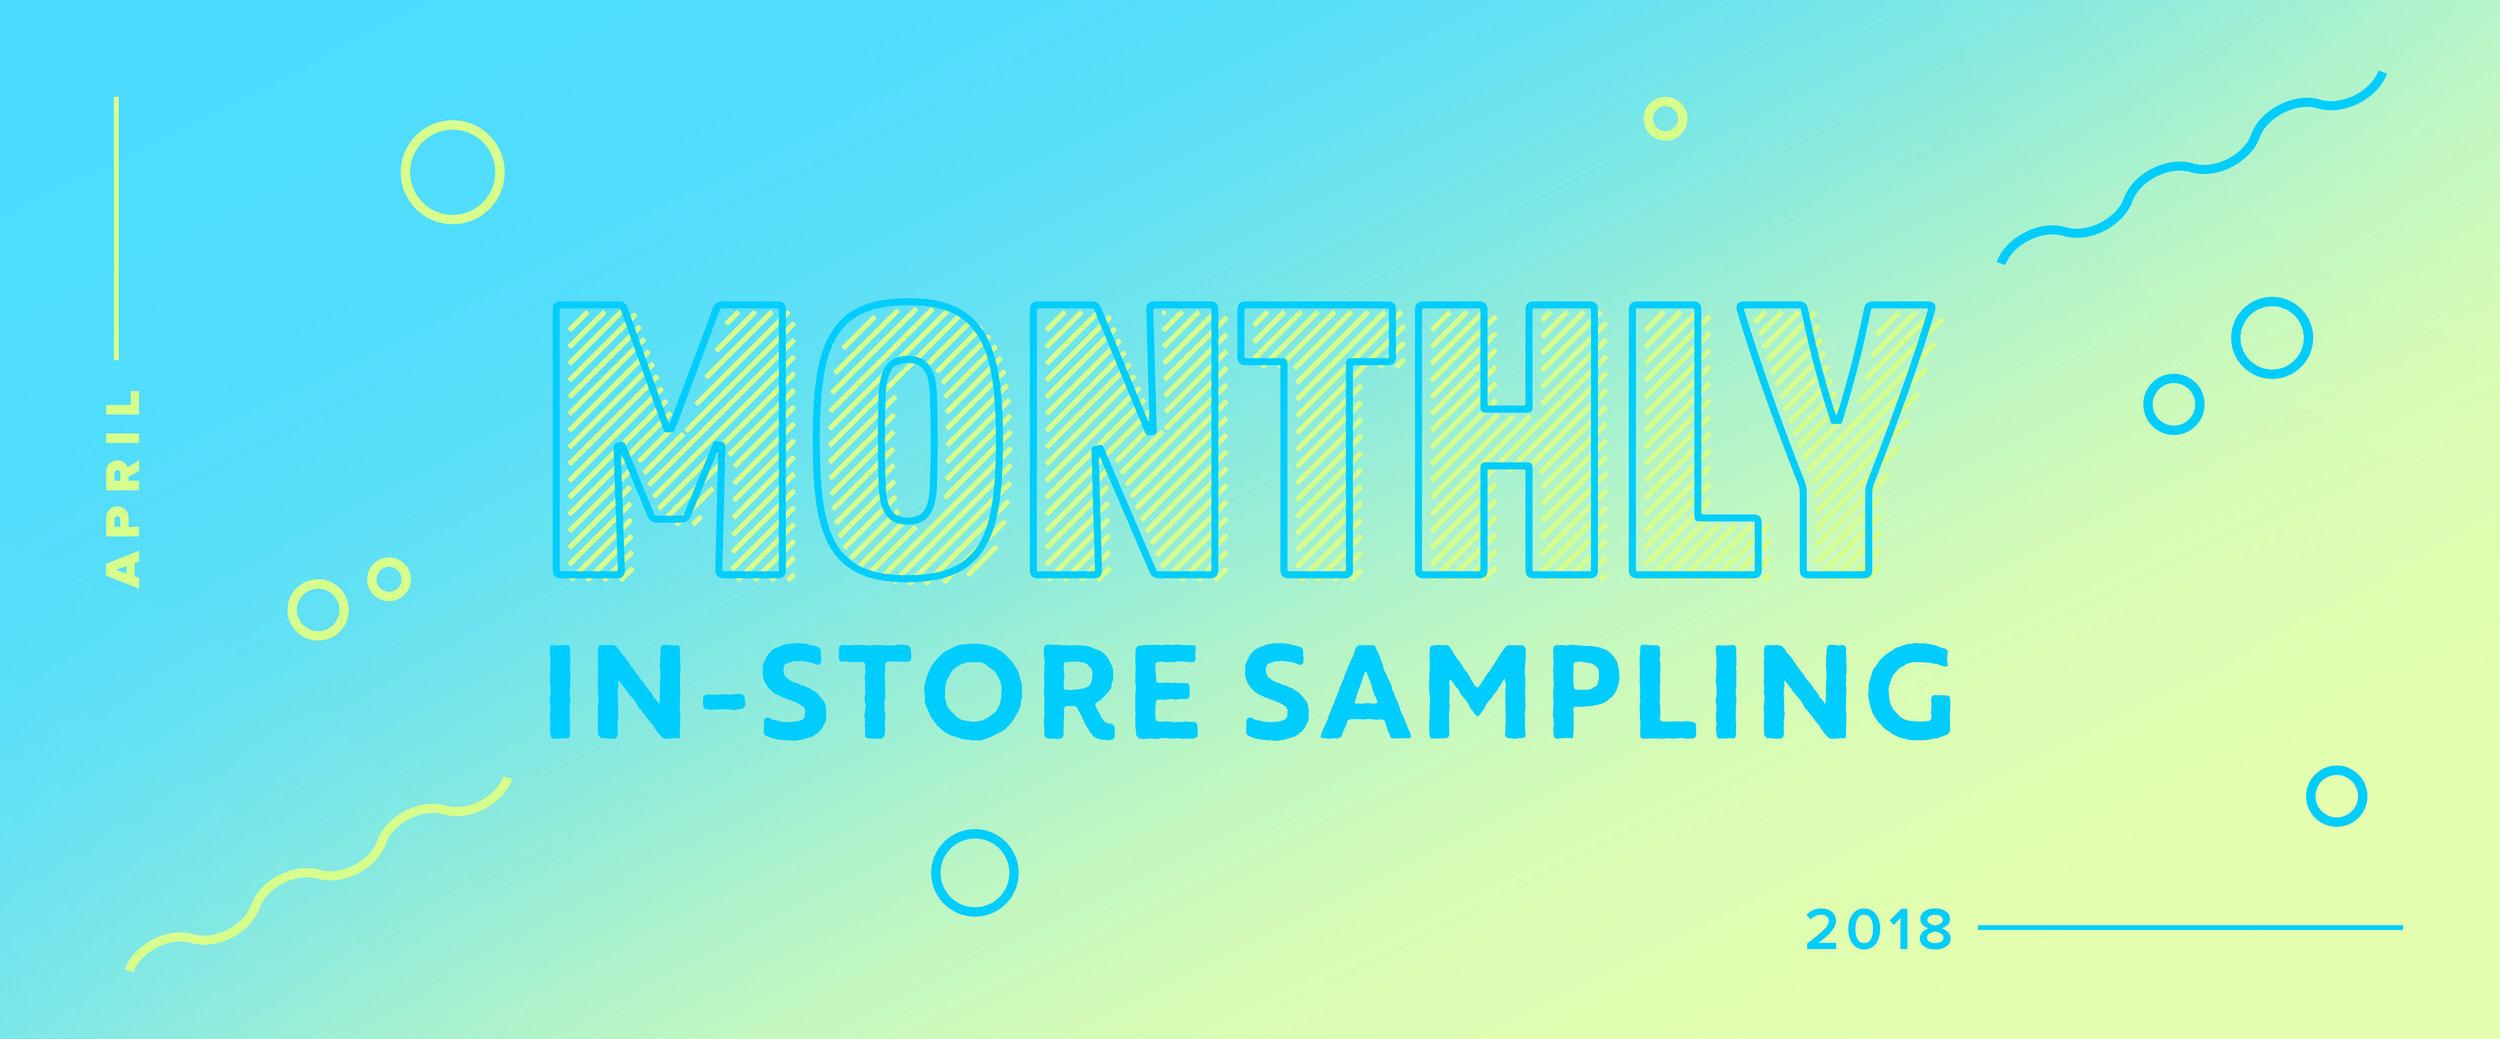 2018_monthly-instore-sampling_april.jpg